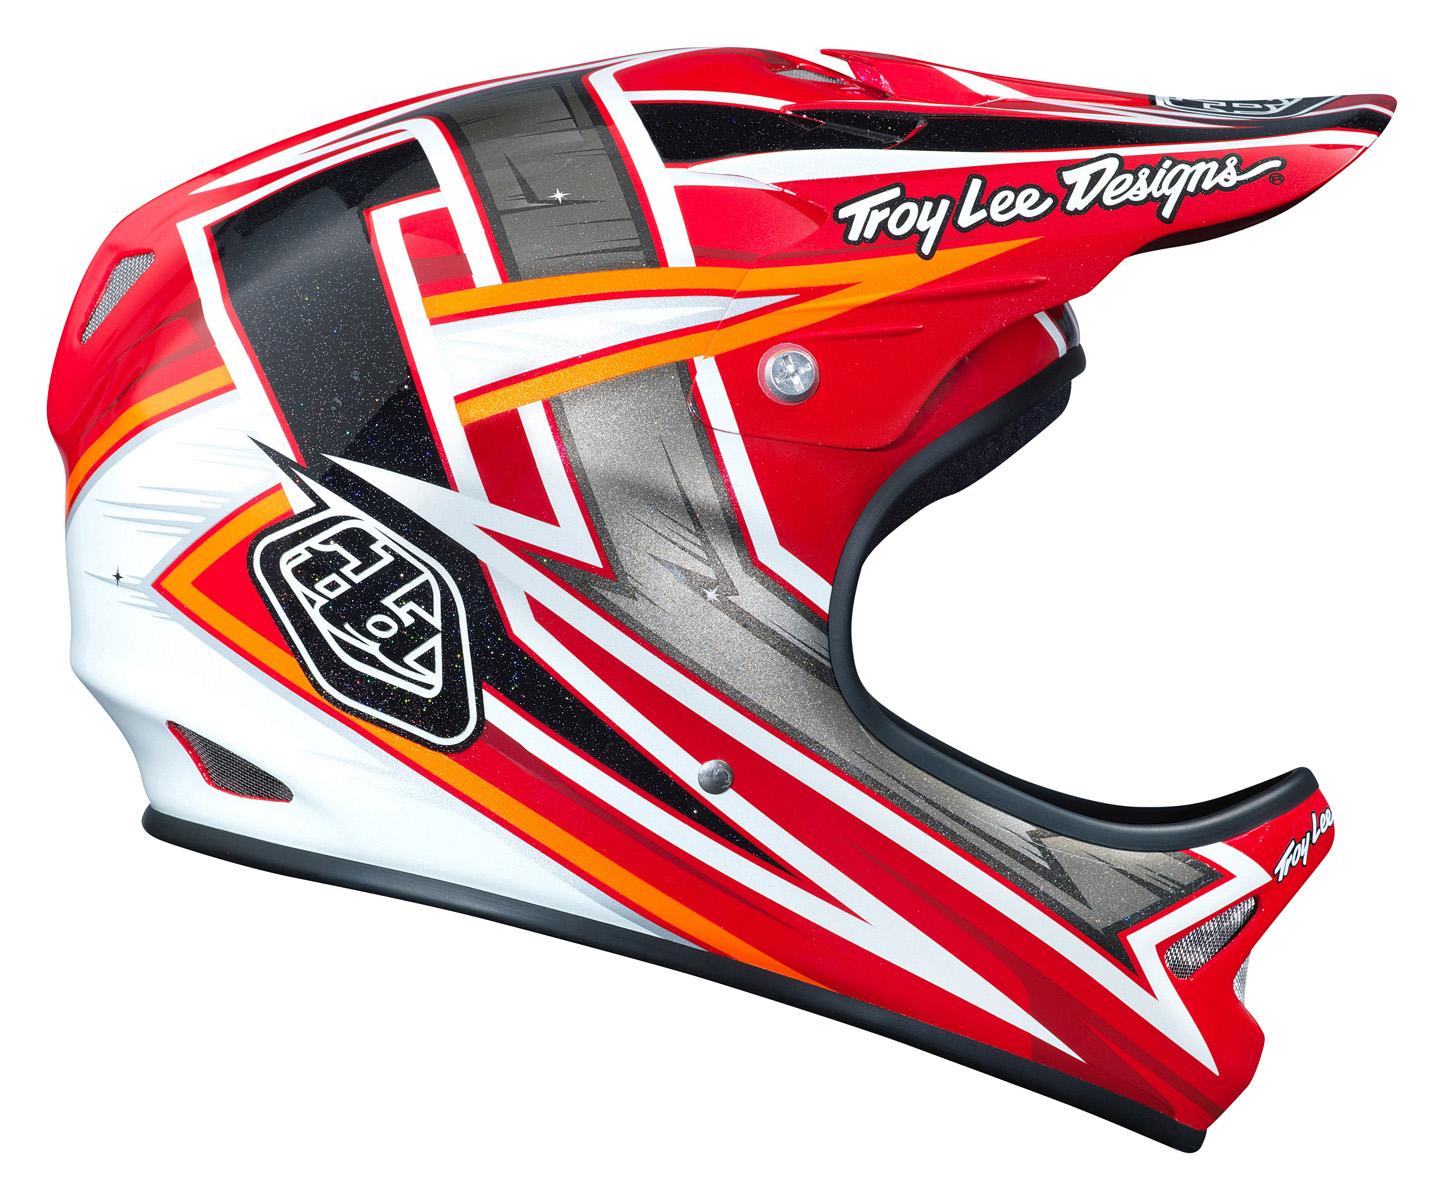 Troy Lee D2 PROVEN RED 289,90 EUR